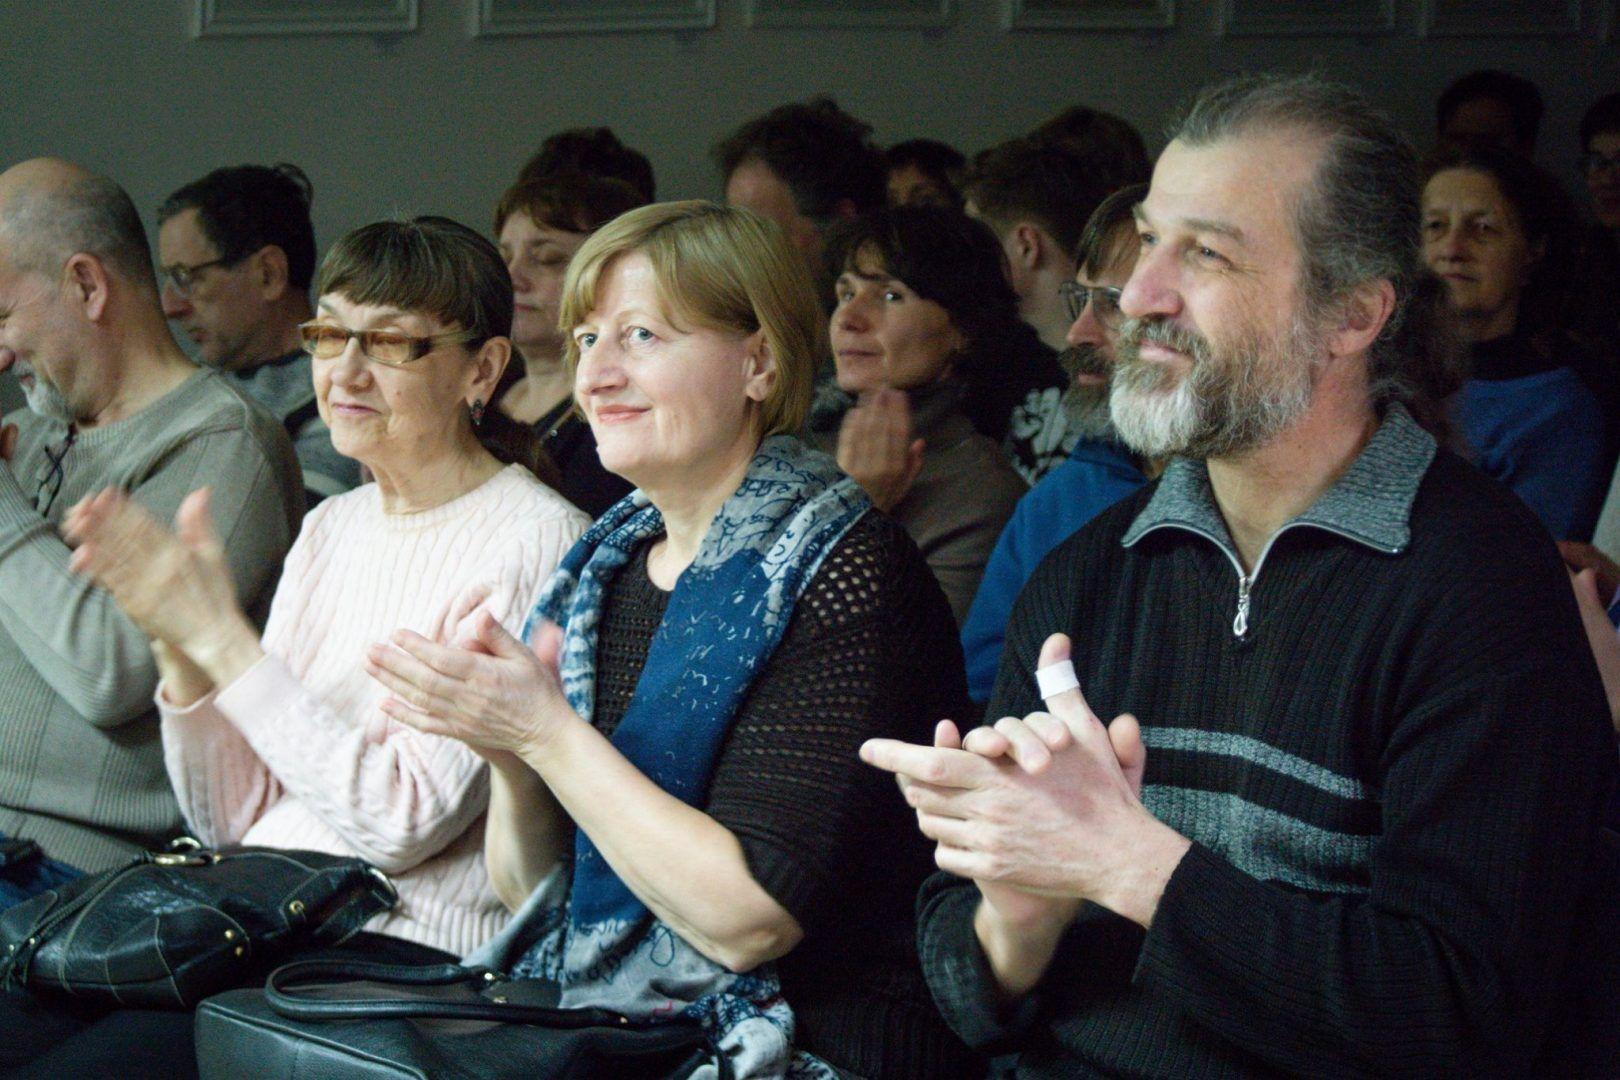 Жители Троицка слушают виртуозное исполнение артиста. Фото: Валентина Таран